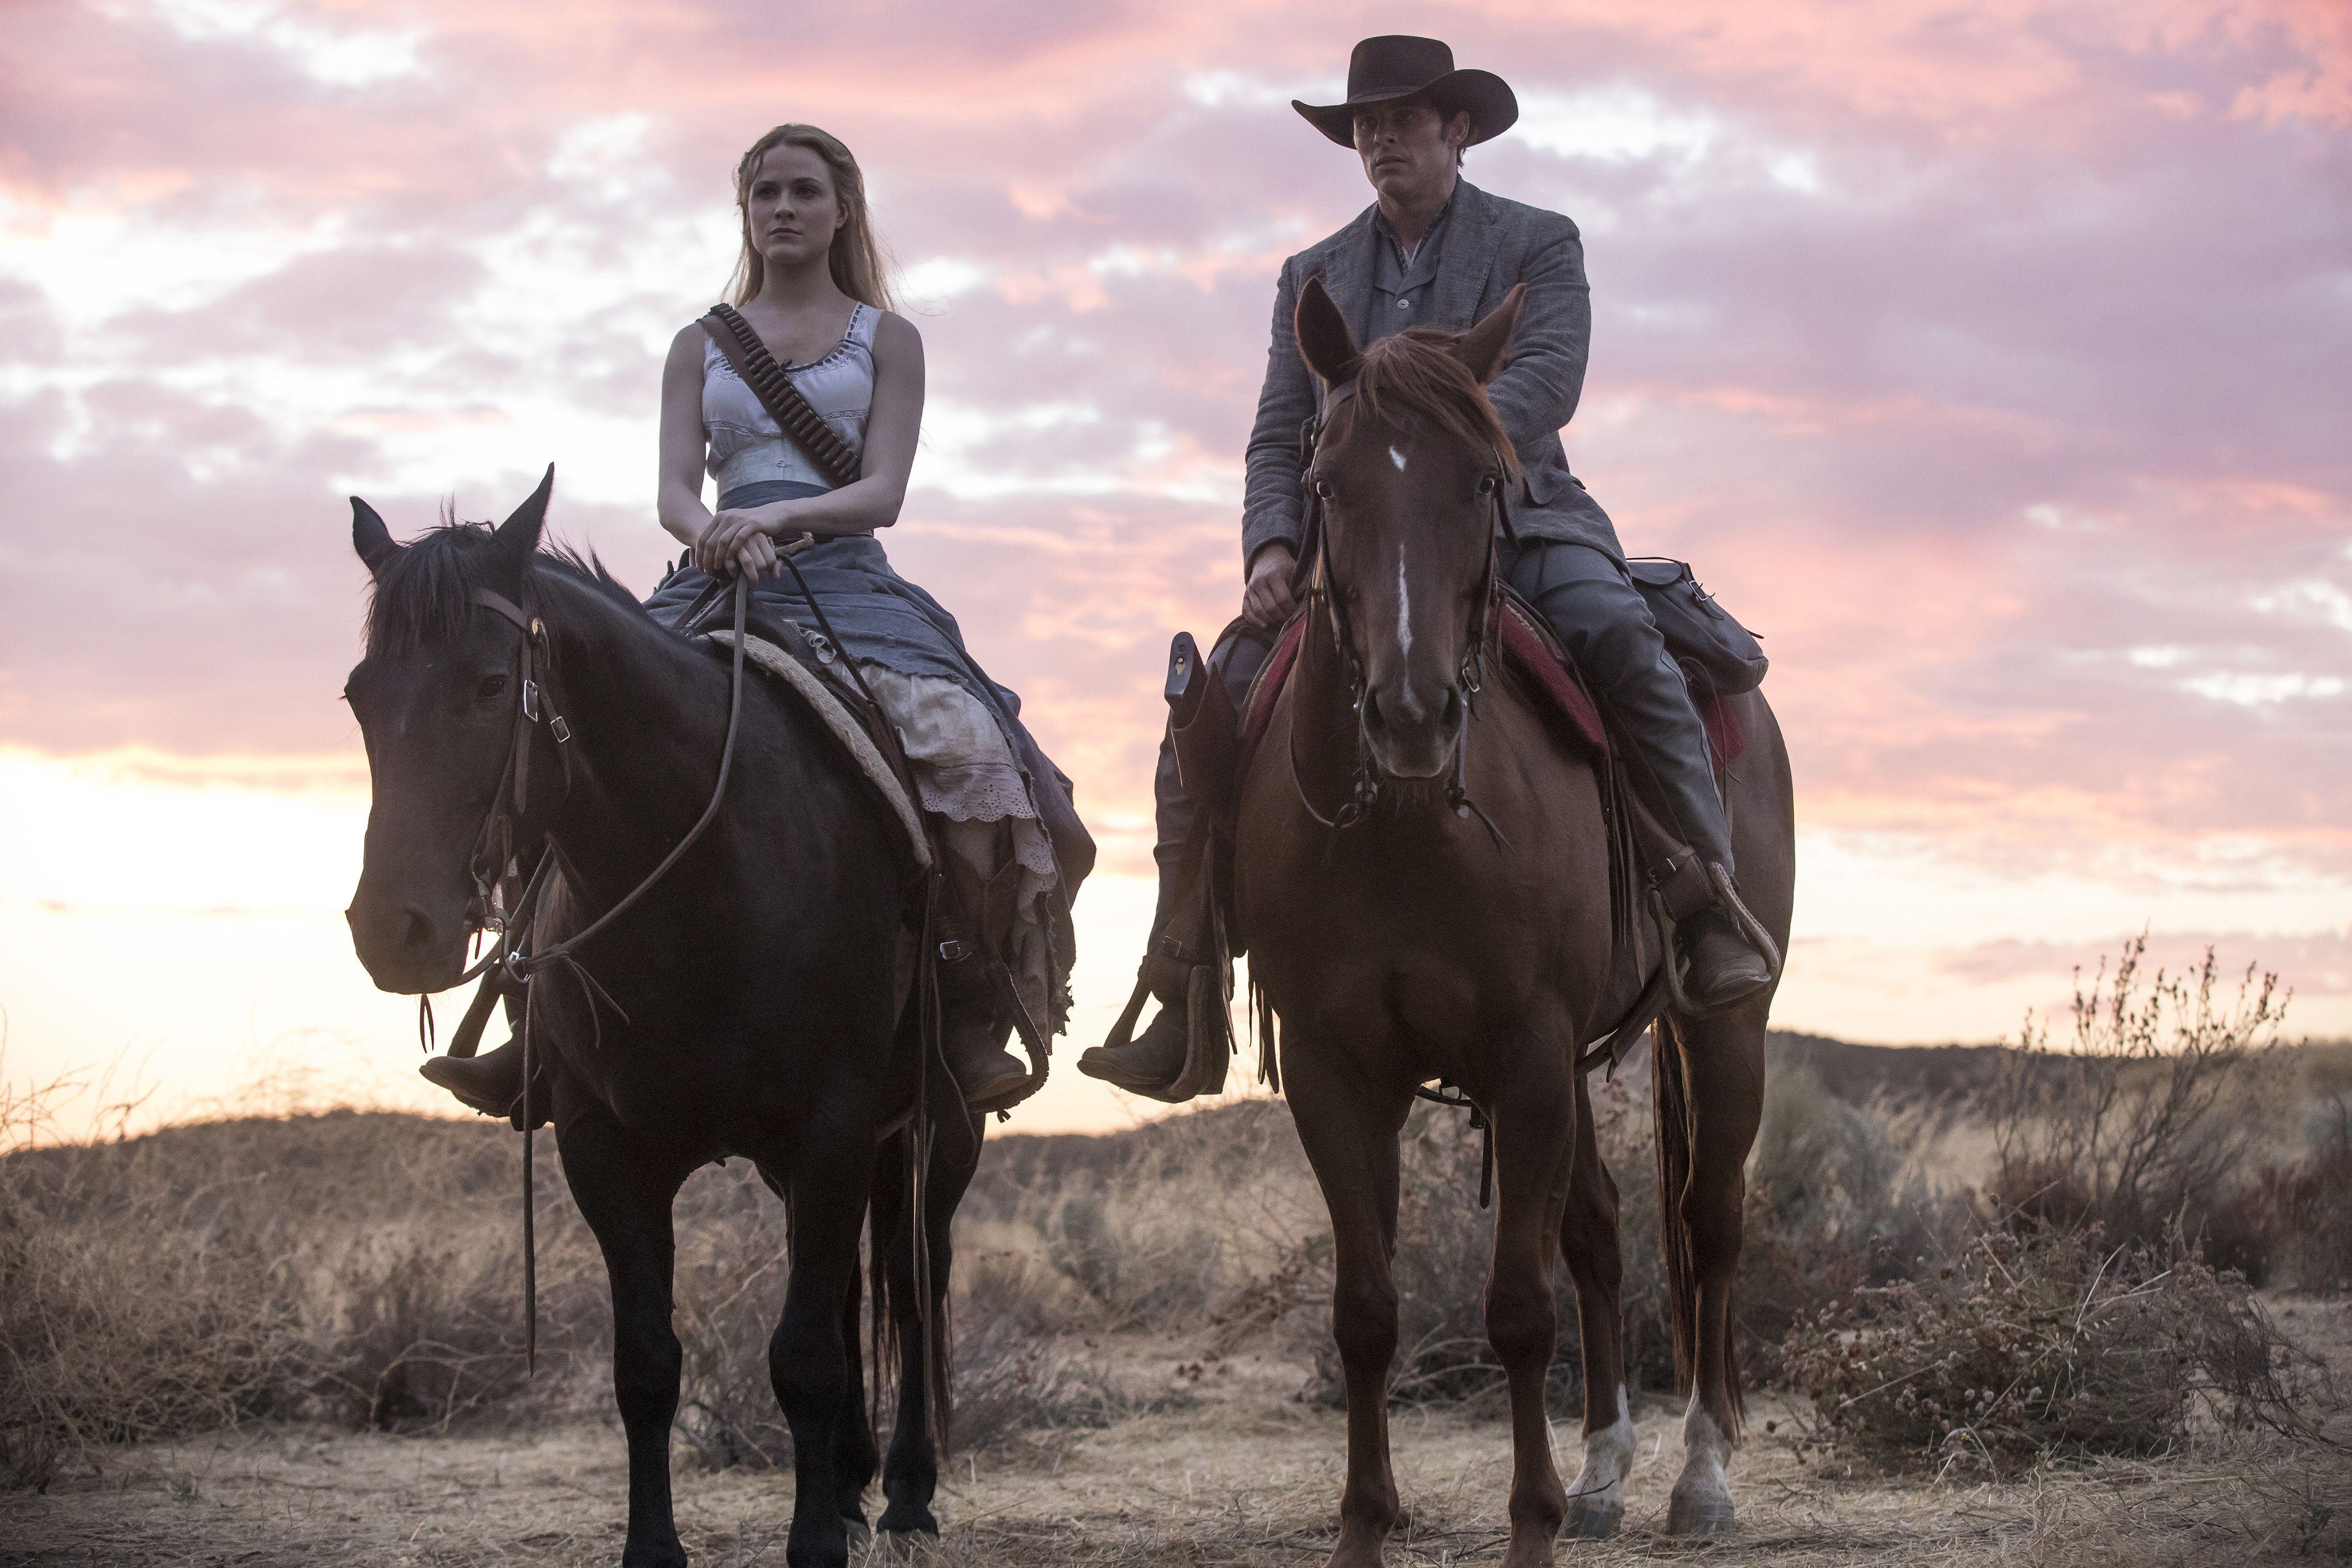 Westworld Season 2 4k, HD Tv Shows, 4k Wallpapers, Images